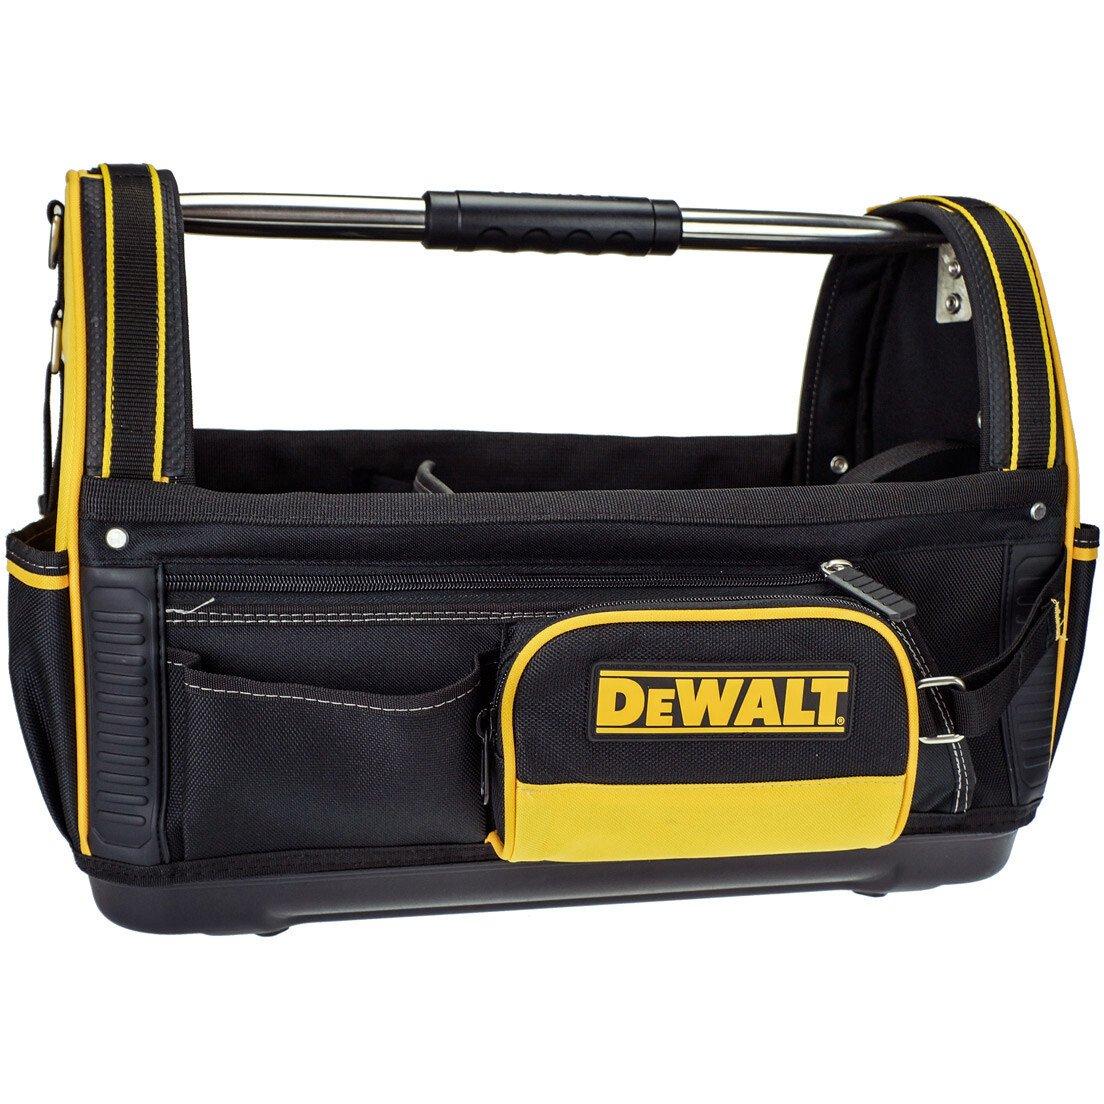 "Dewalt 1-79-208 Open Tote Tool Bag 18"""